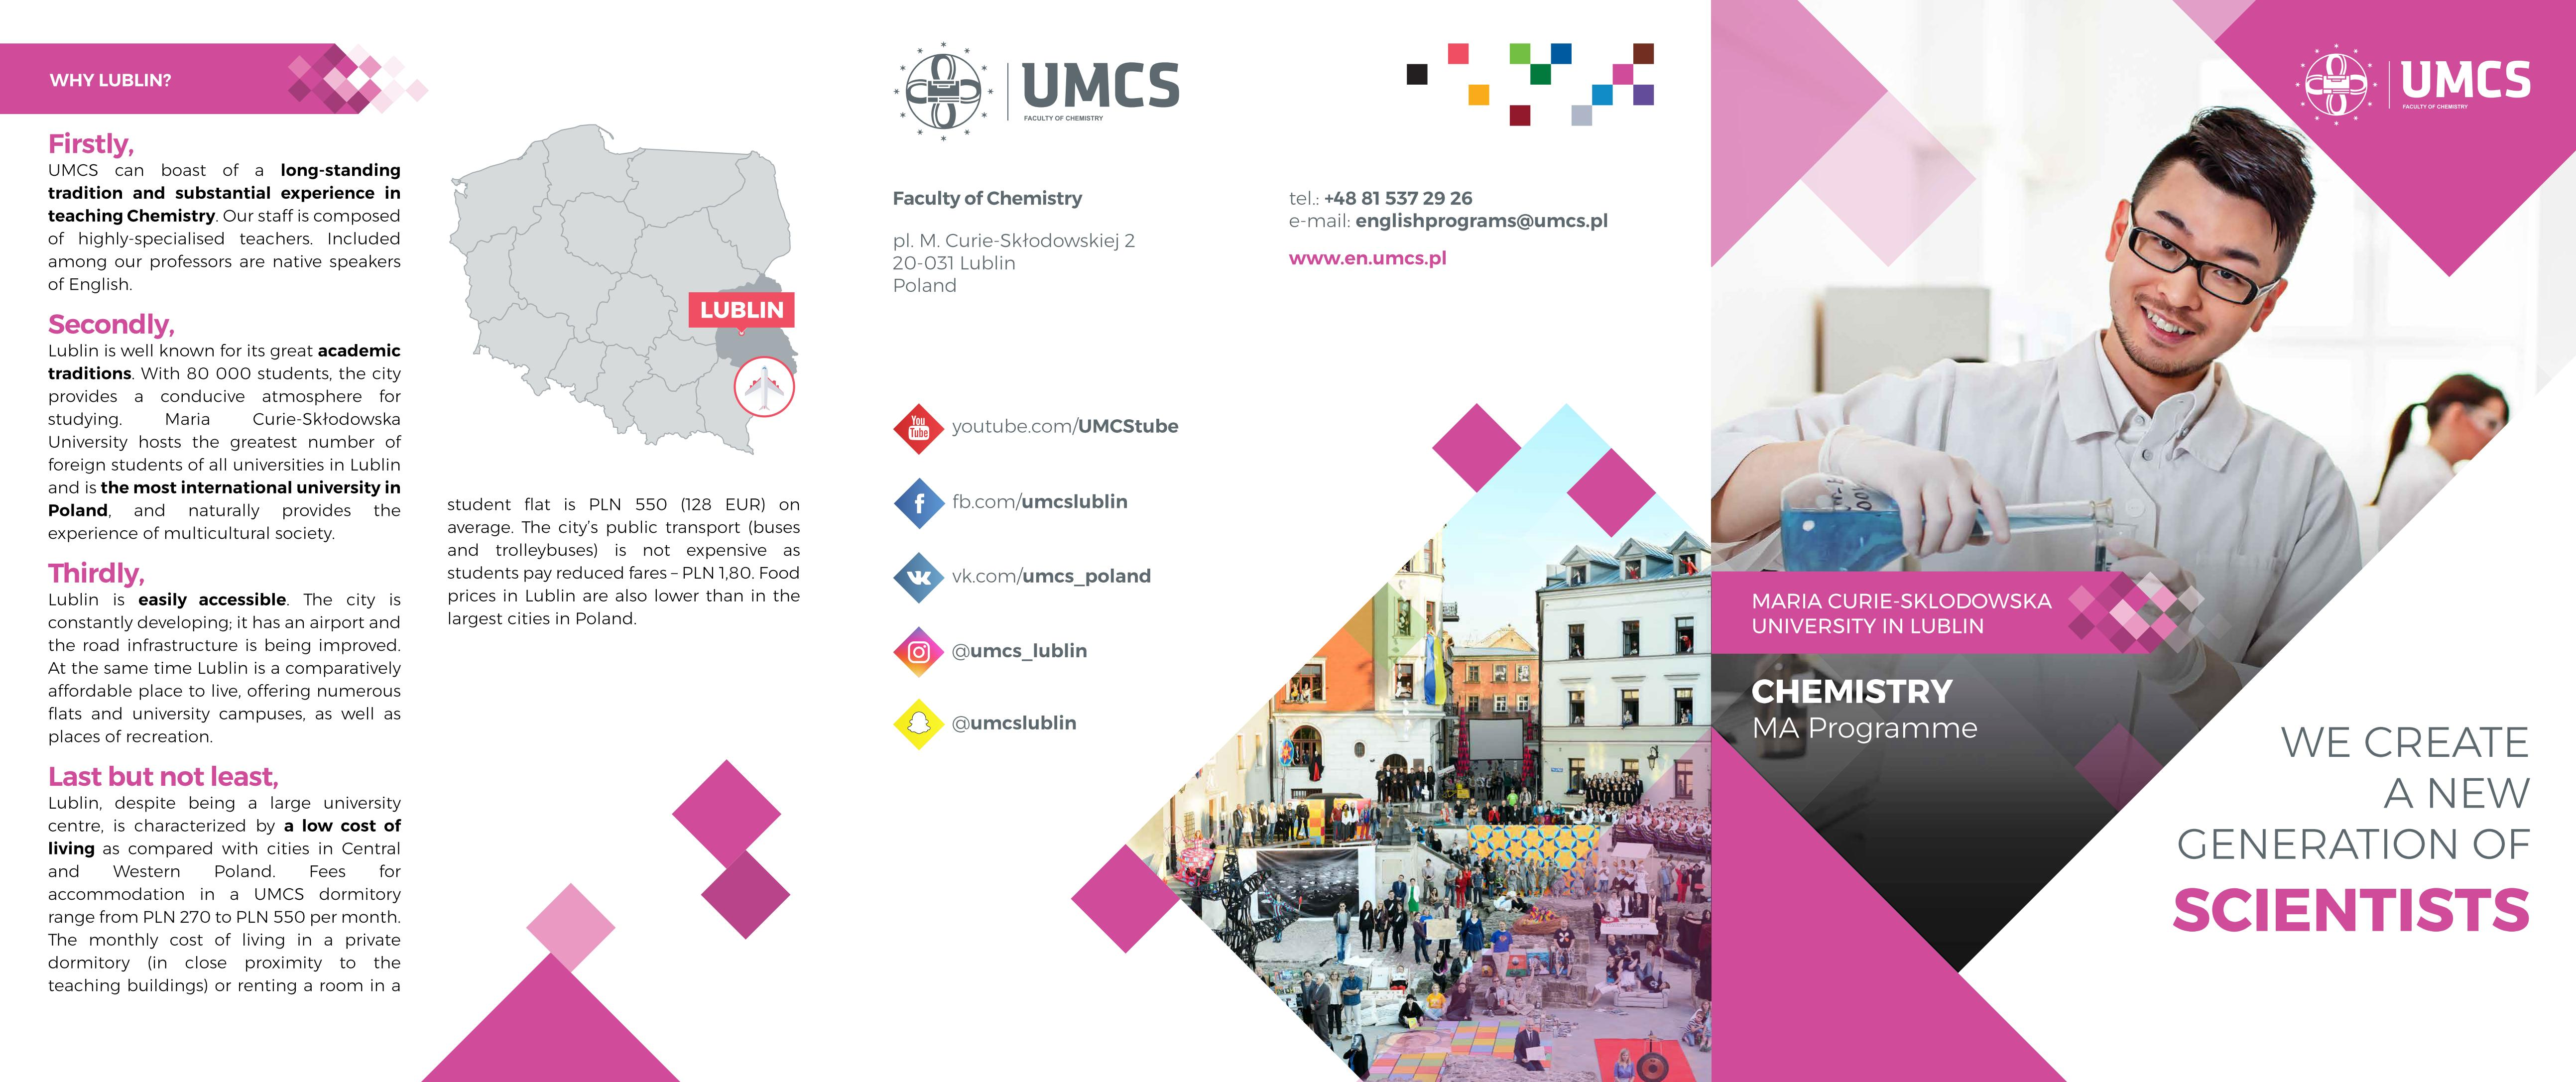 Chemistry MSc Programme.jpg